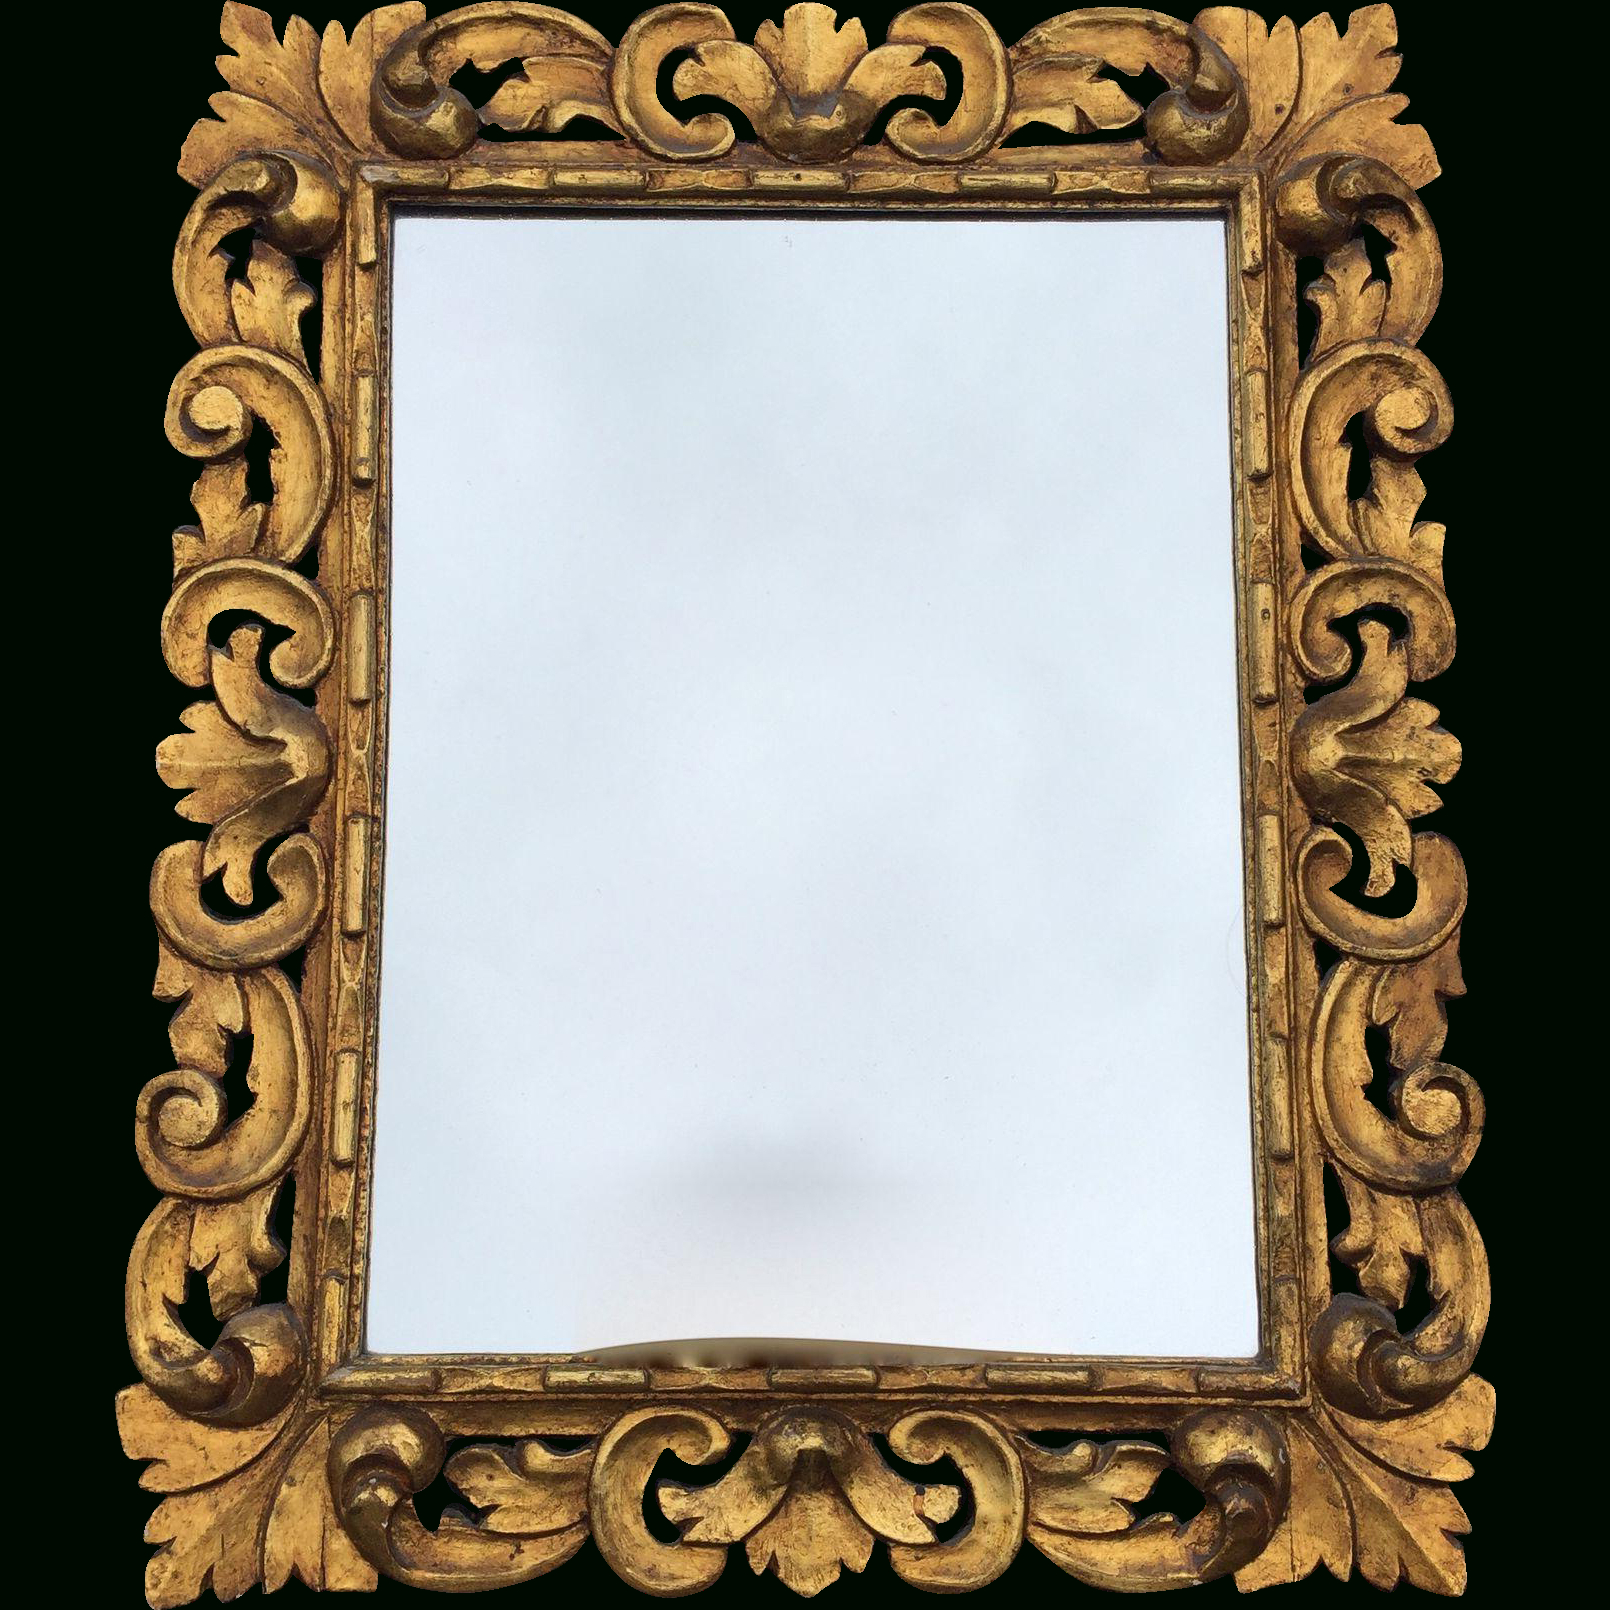 Mirror Regarding Baroque Wall Mirrors (View 5 of 20)